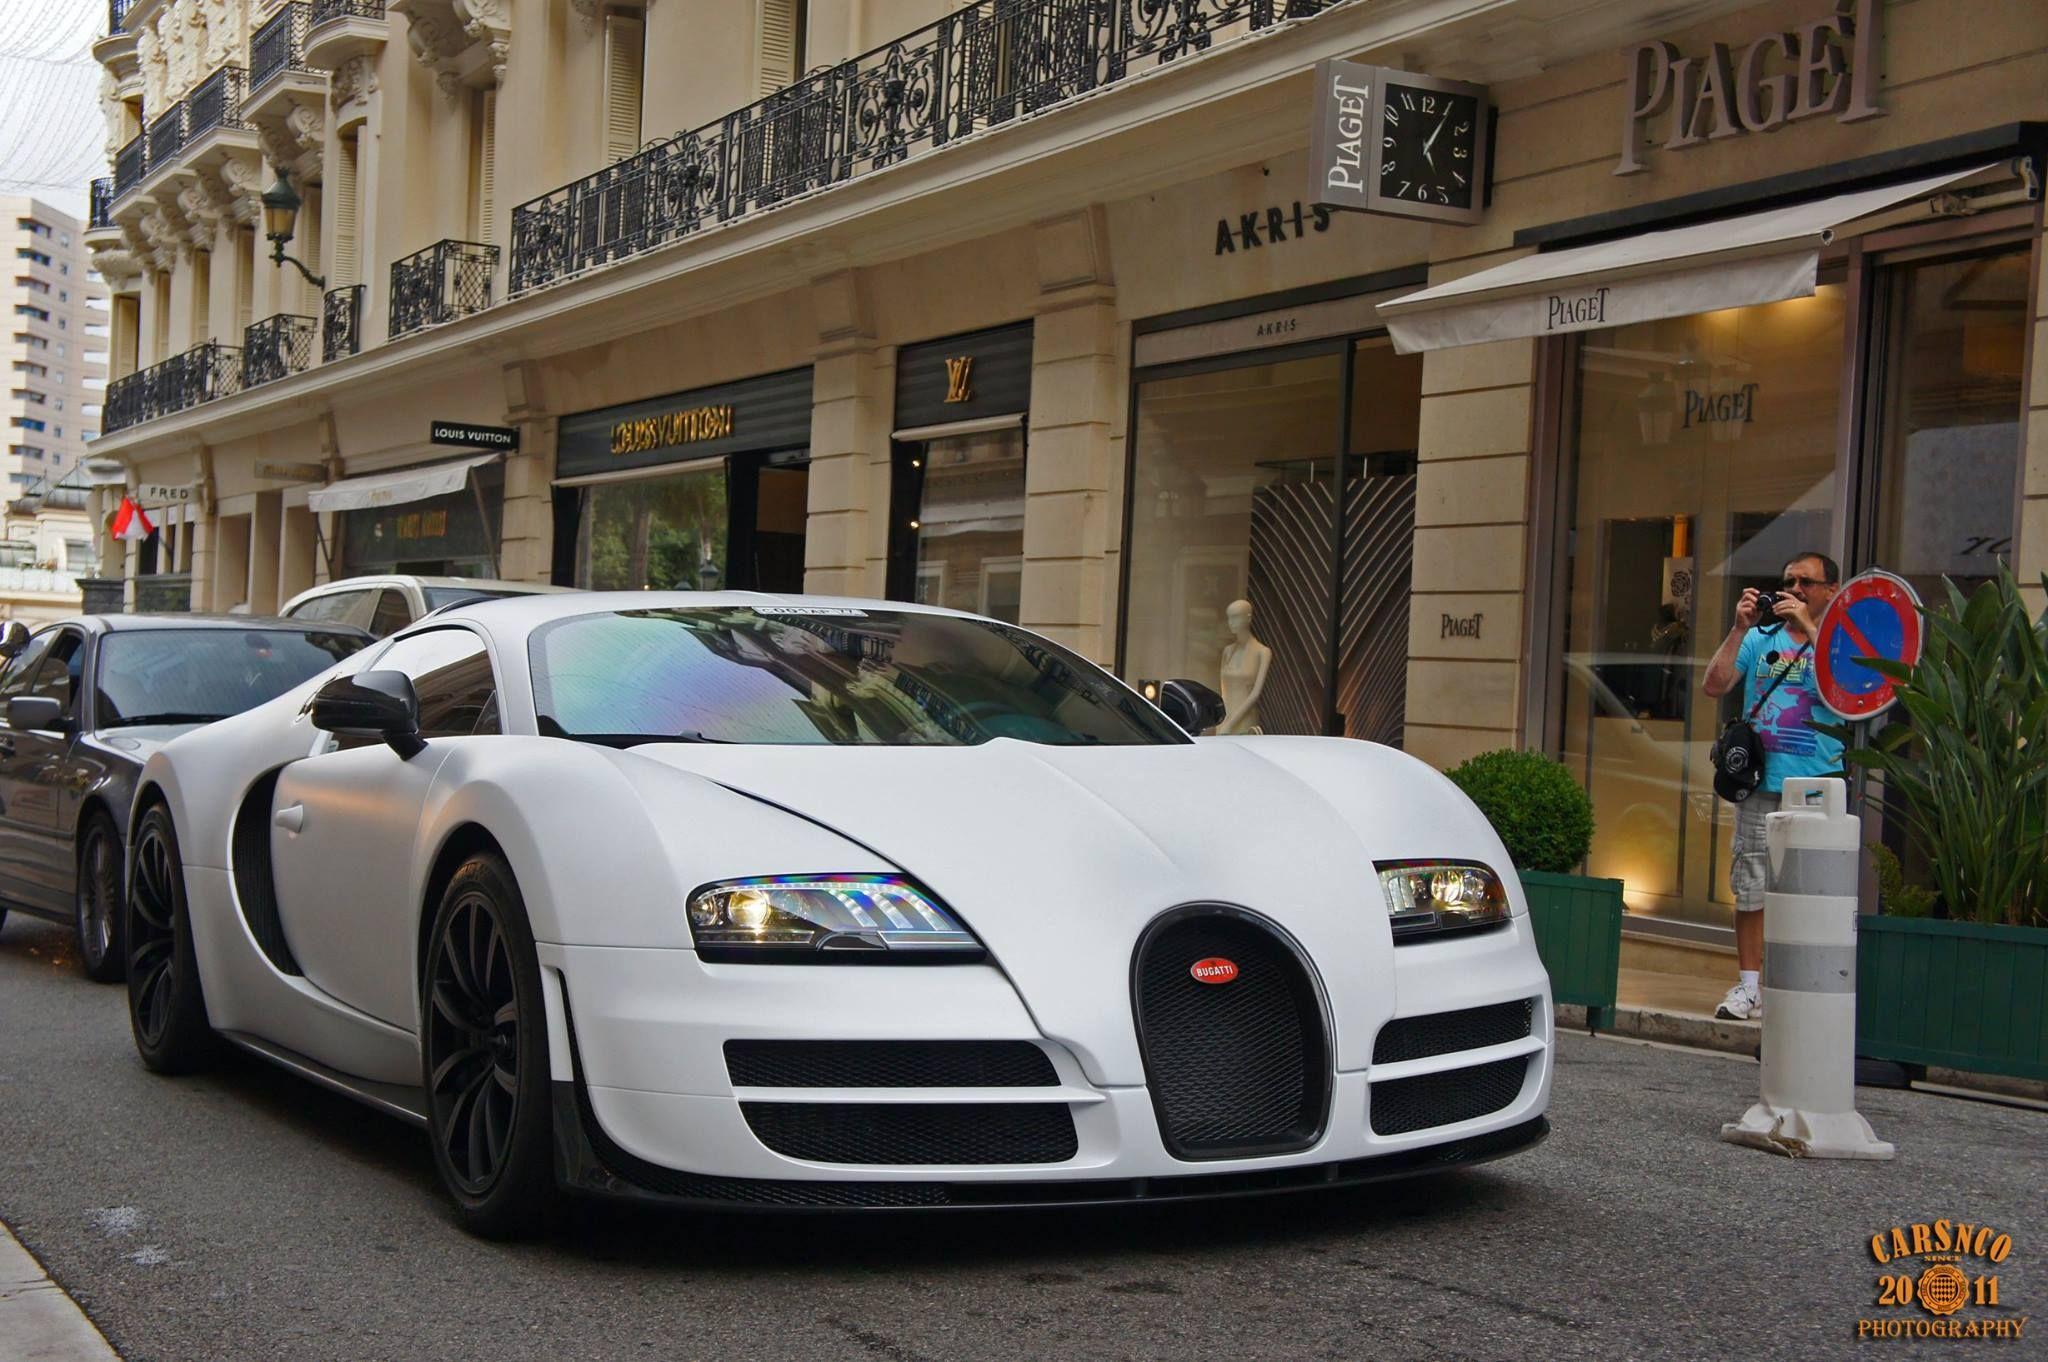 Monaco driver causes intrigue with newly modified Bugatti Veyron  - http://www.modifiedcars.com/cars/532161/monaco-driver-causes-intrigue-with-newly-modified-bugatti-veyron